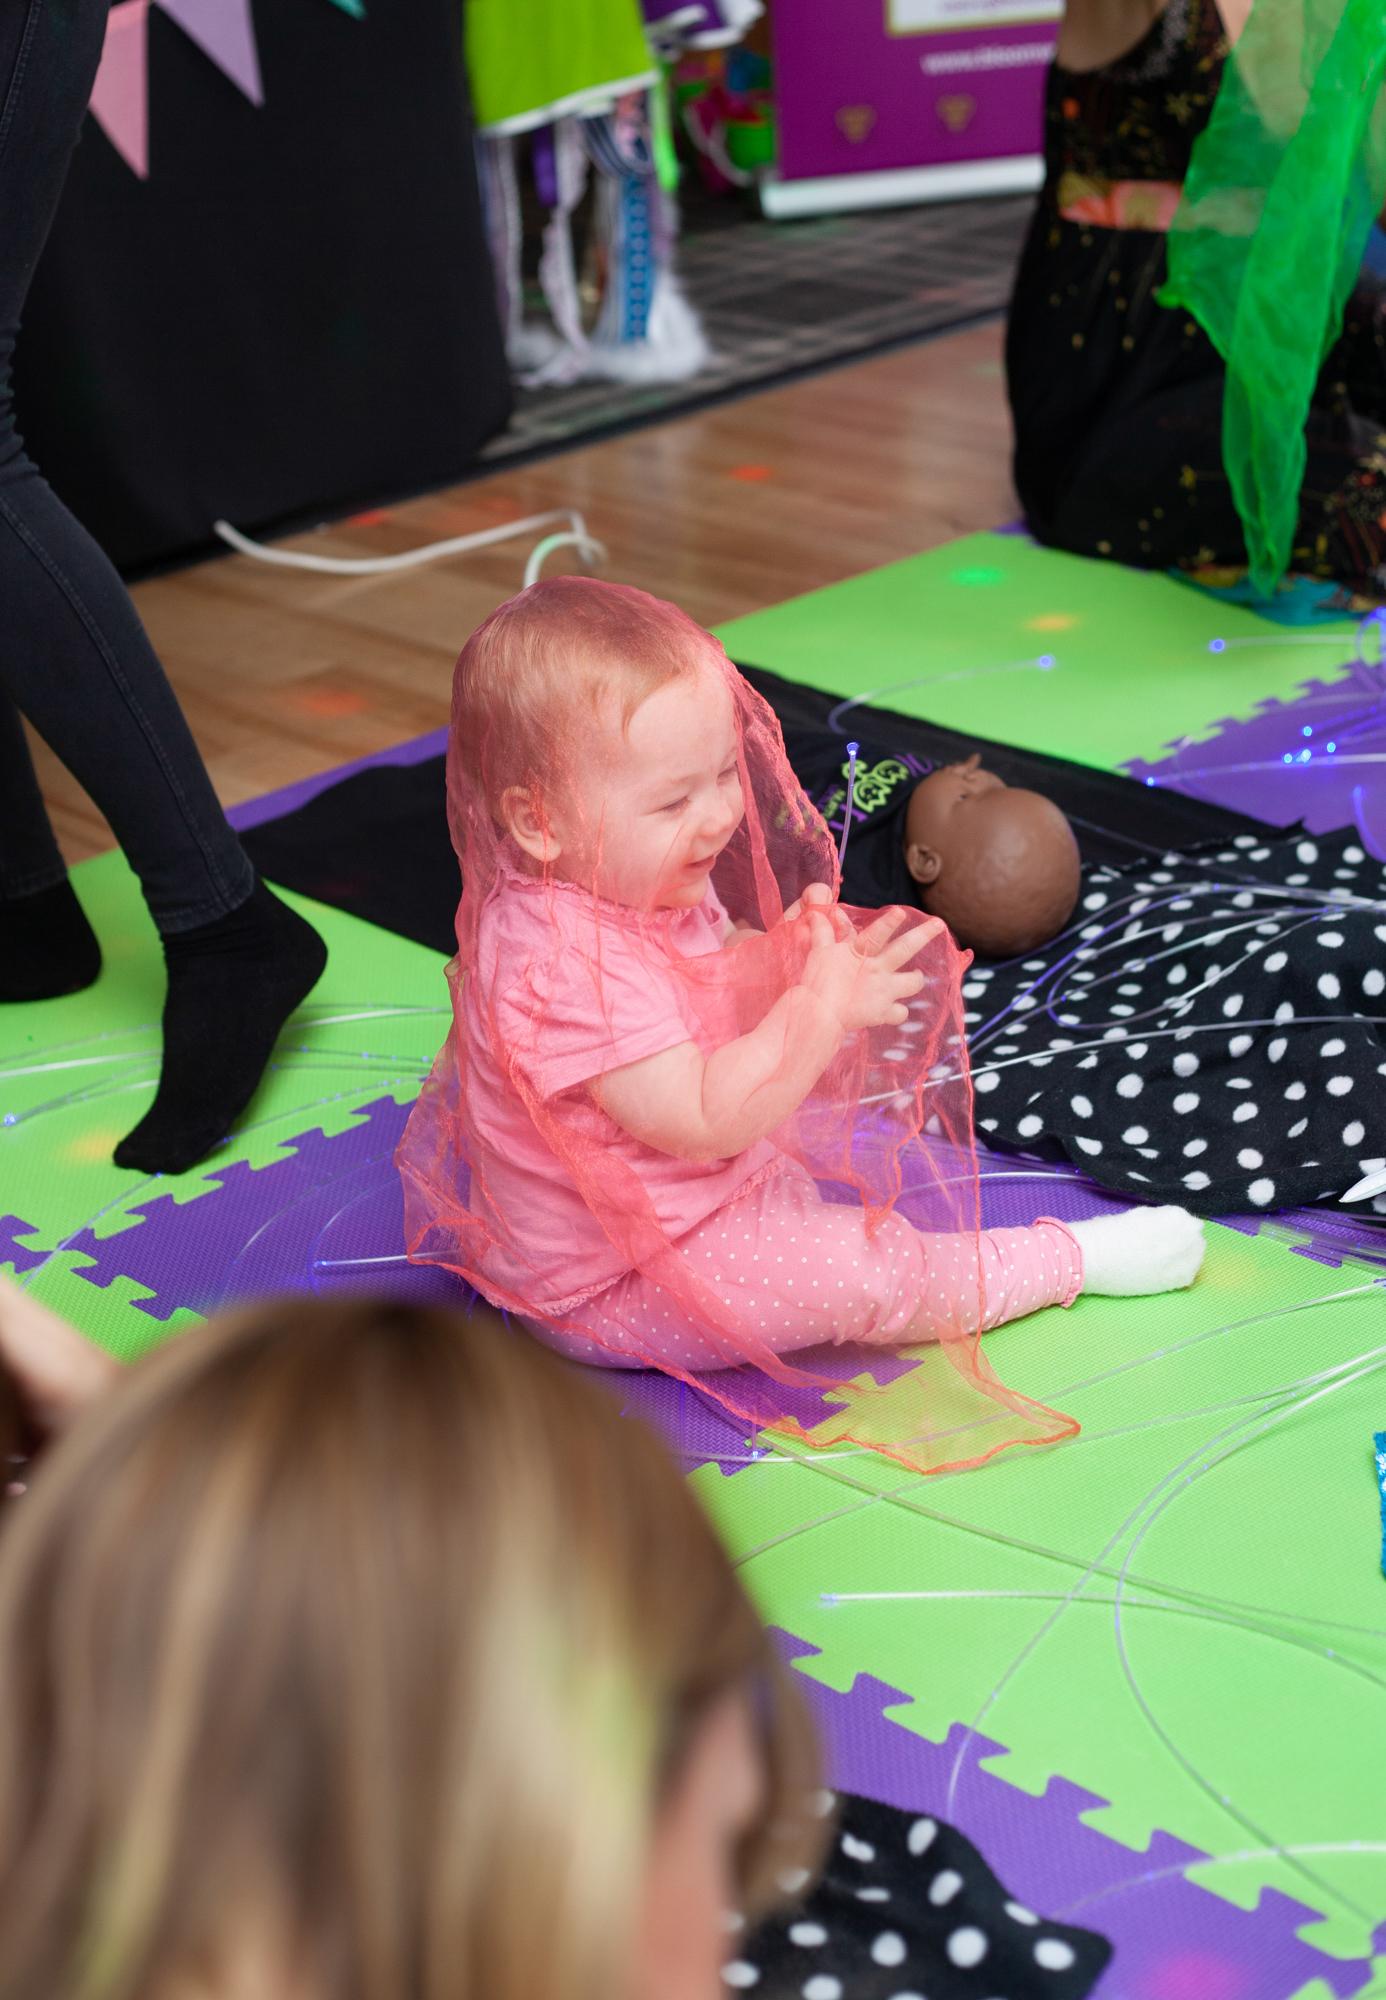 baby-class-photography-photographer-manchester-cheshire-12.jpg